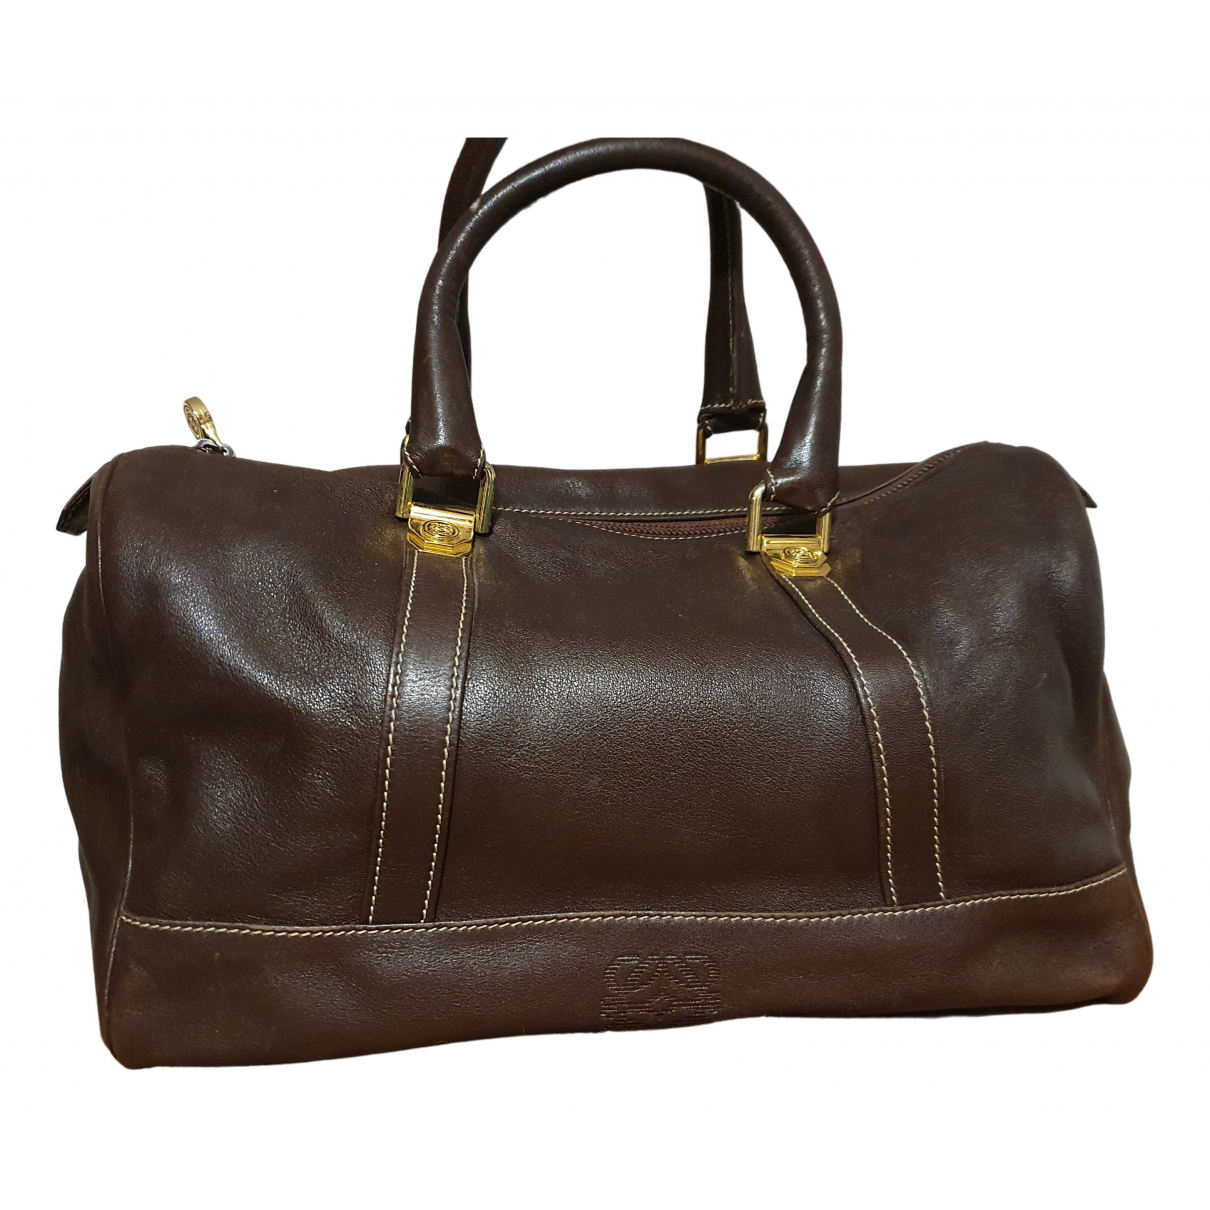 Loewe - Sac a main   pour femme en cuir - marron